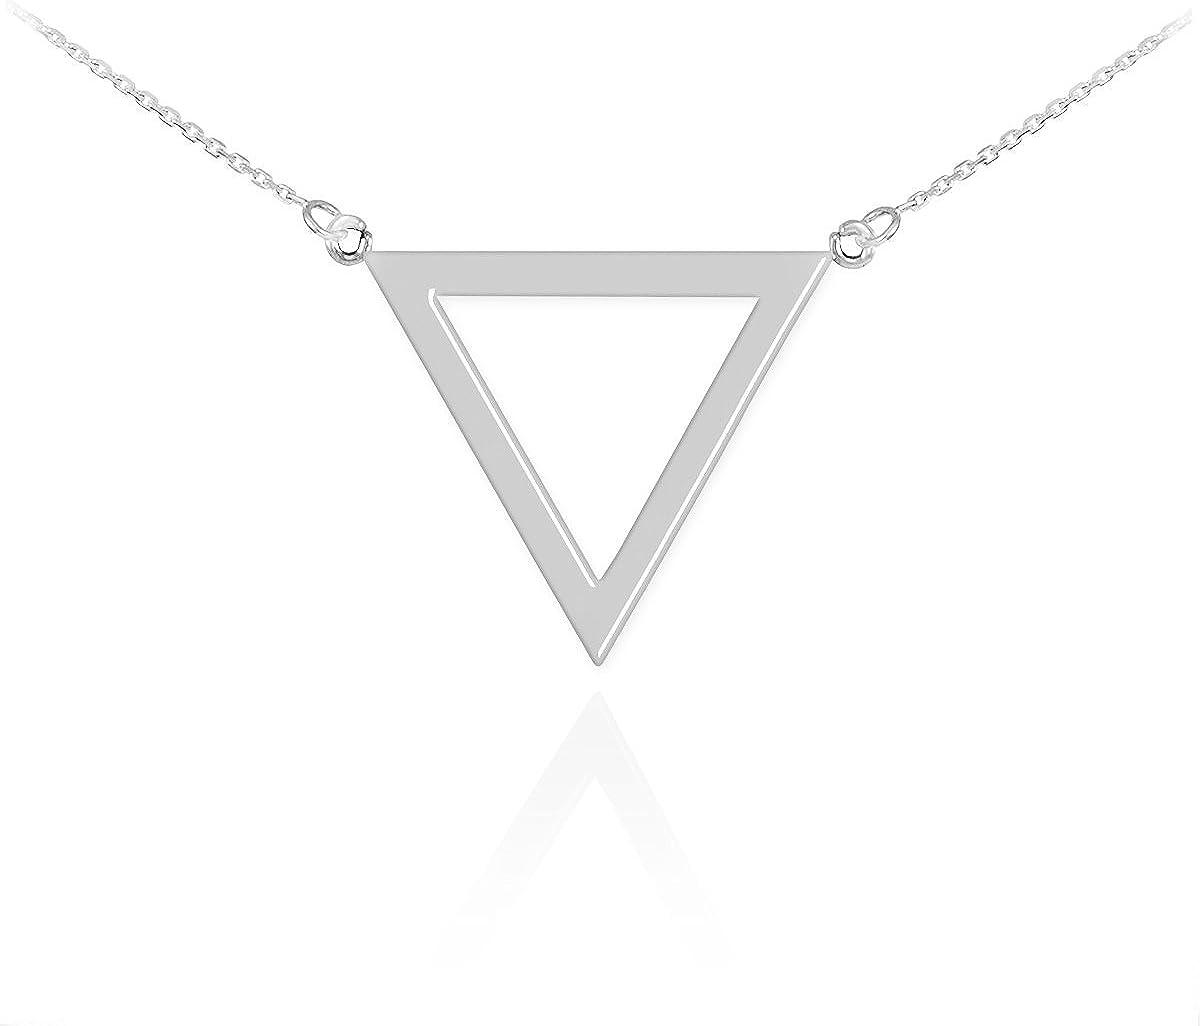 Delicate Hollowed Triangle Necklace Little Mini Gold Color//Silver Color Triangle